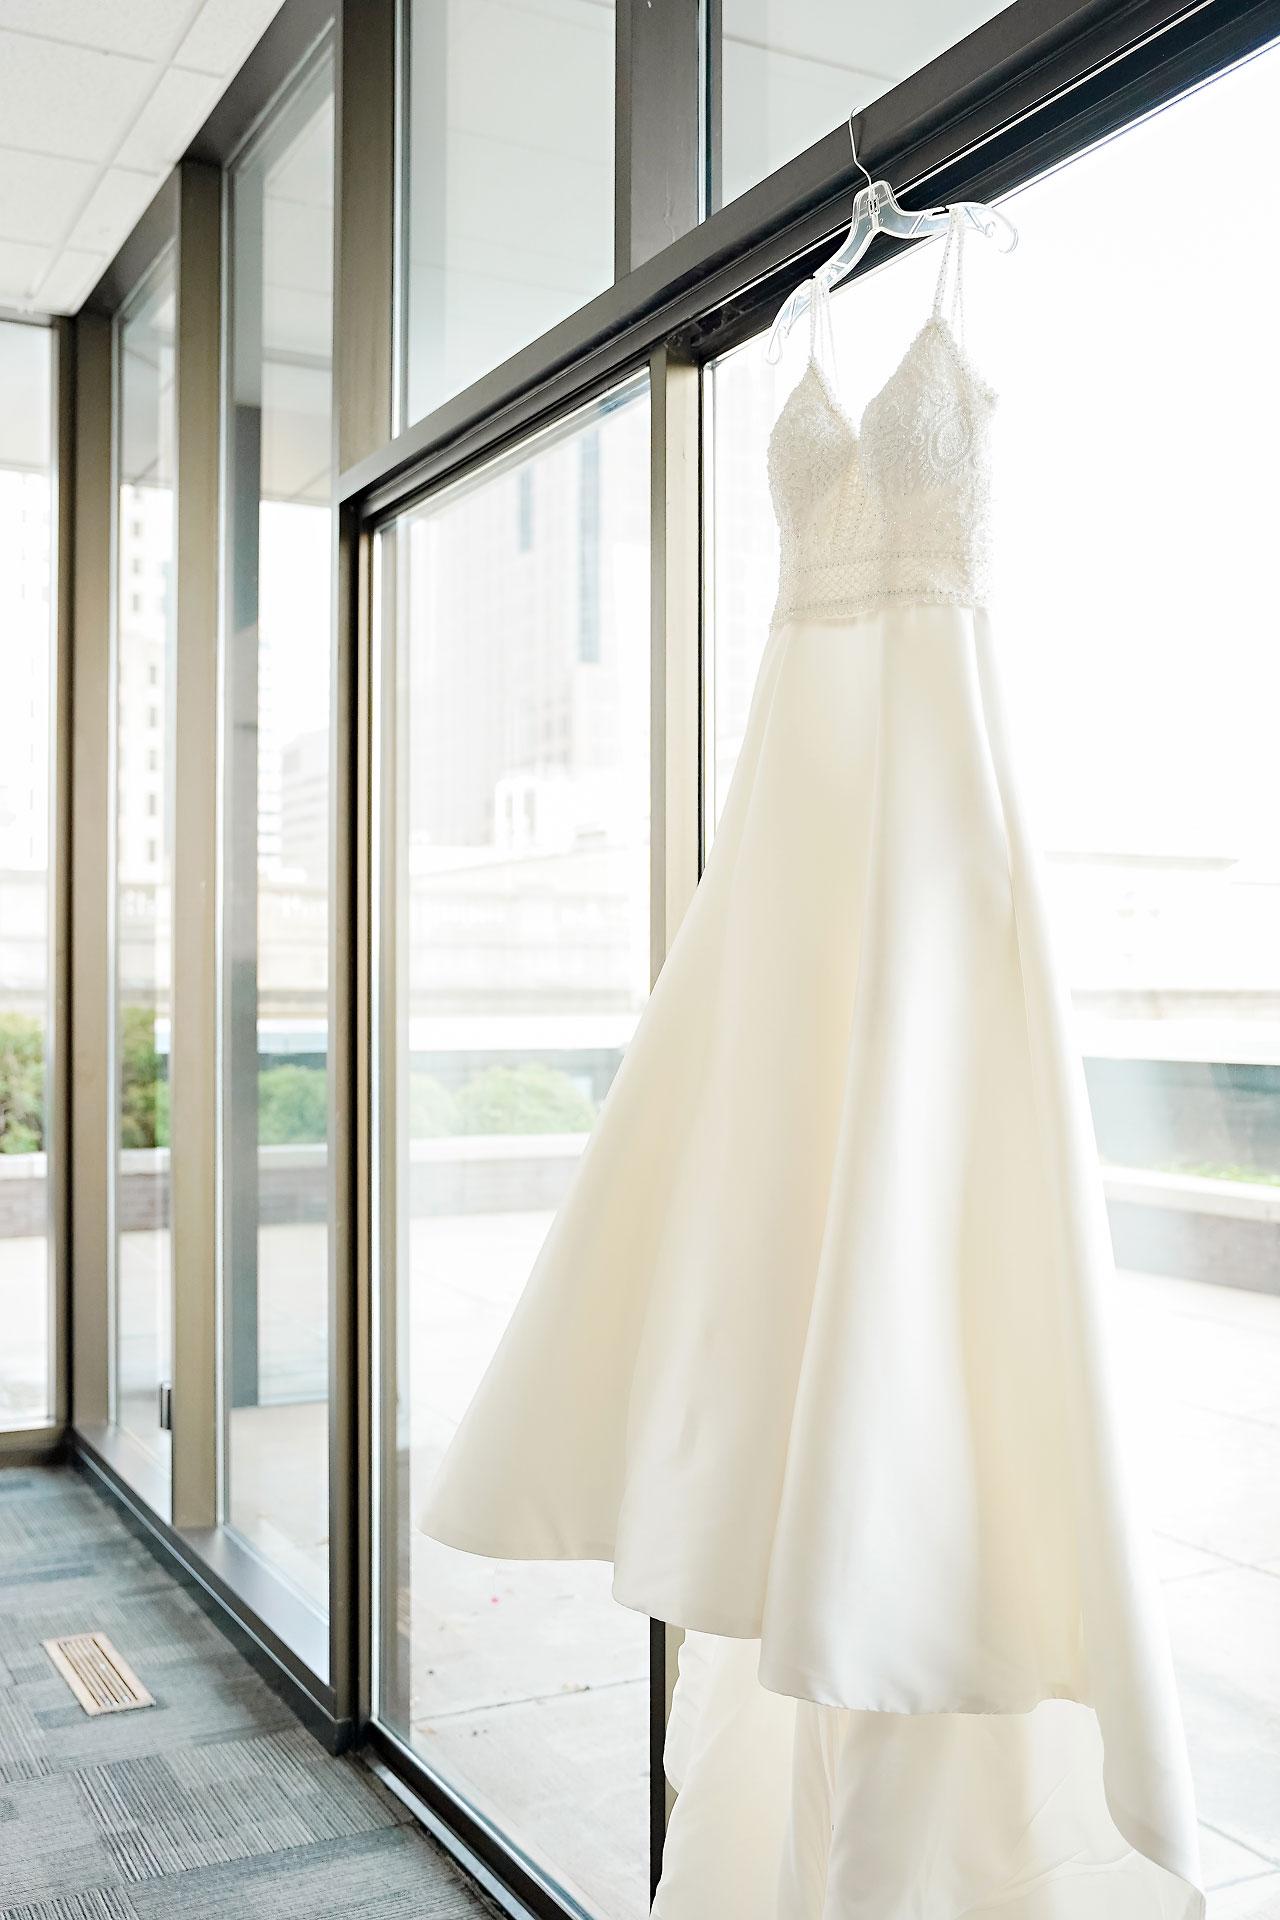 Sammi Jack Regions Tower JPS Events Indianapolis Wedding 004